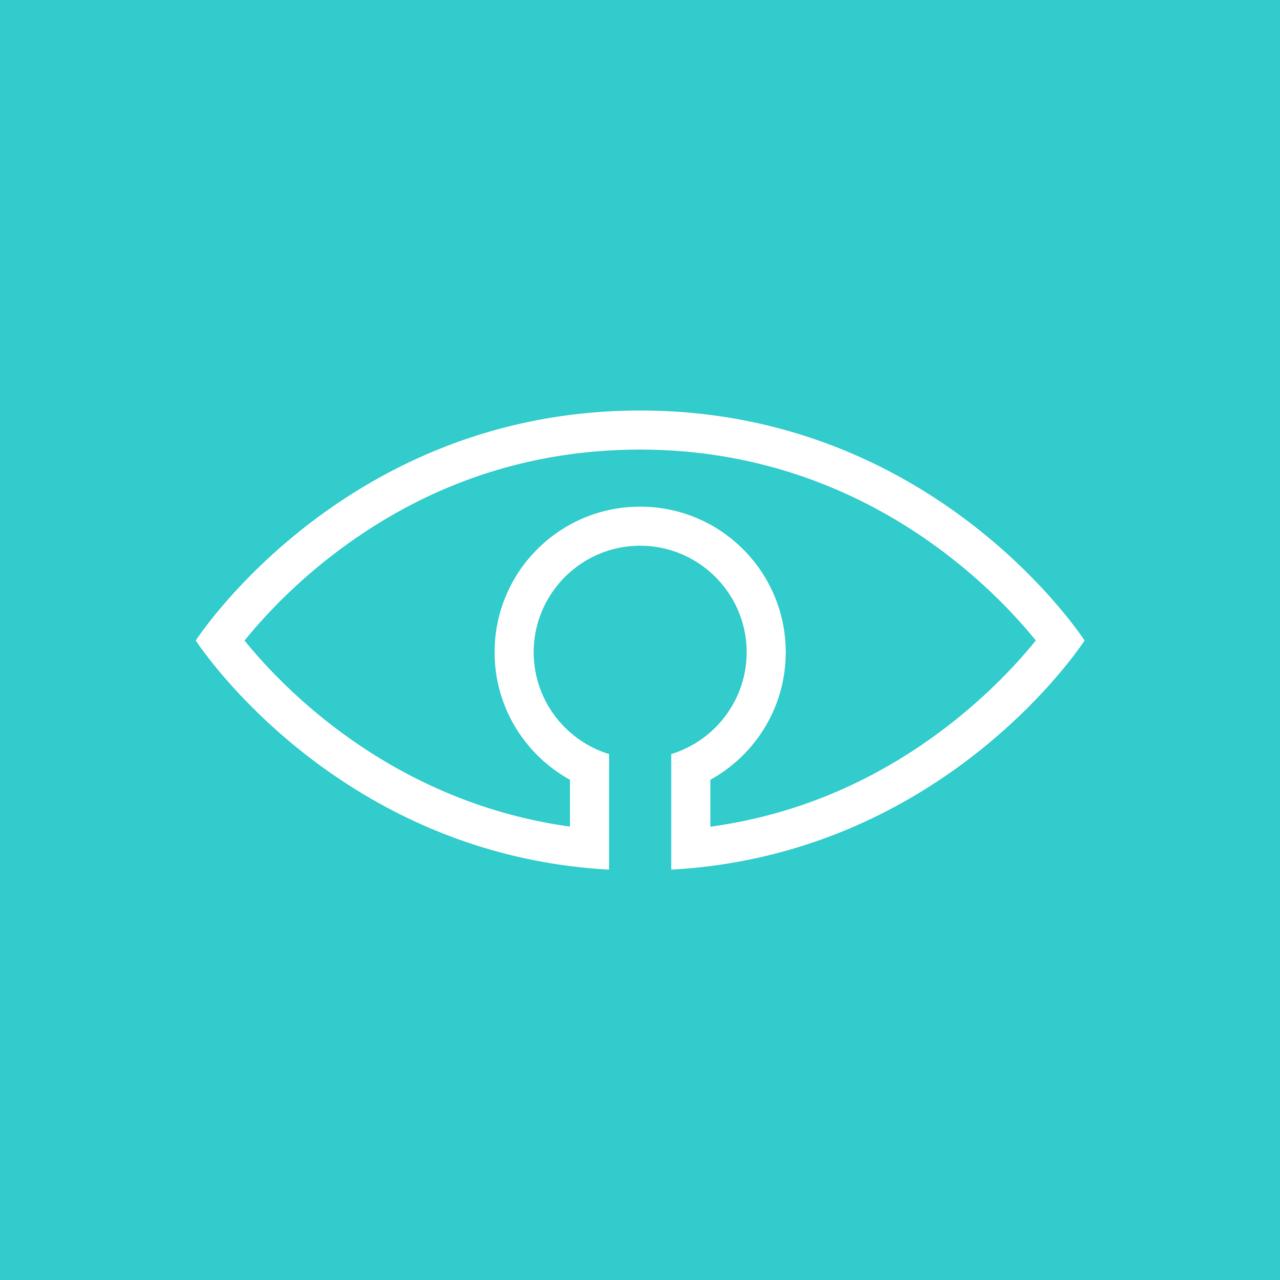 Sigtay Lampen Designer Michel Olyff Firm N A Year 1967 History Logo Logo Design Cloud Drawing